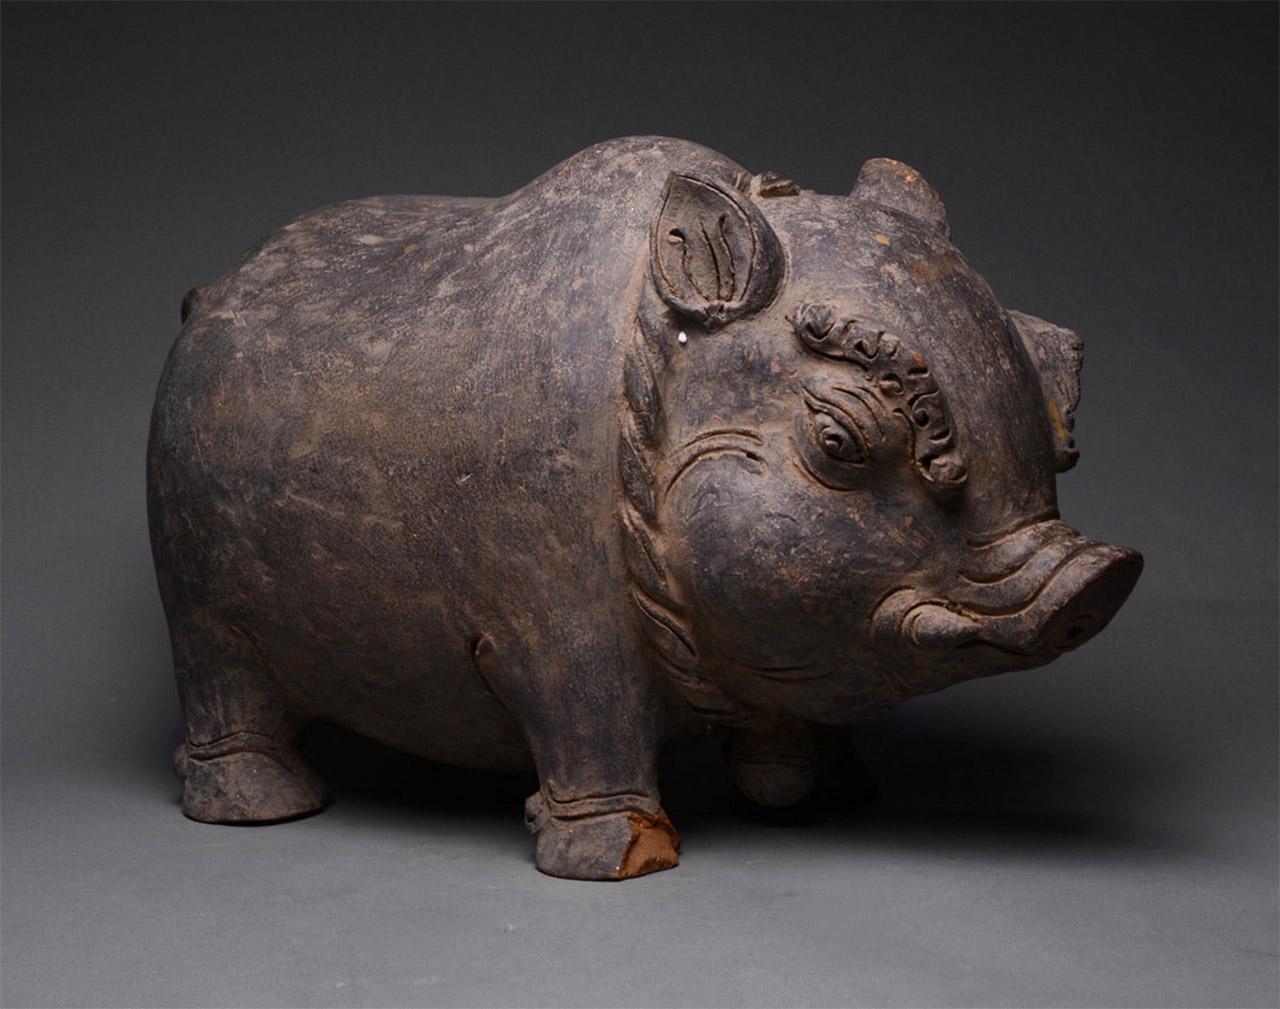 The Vedic Origins of the Piggy Bank